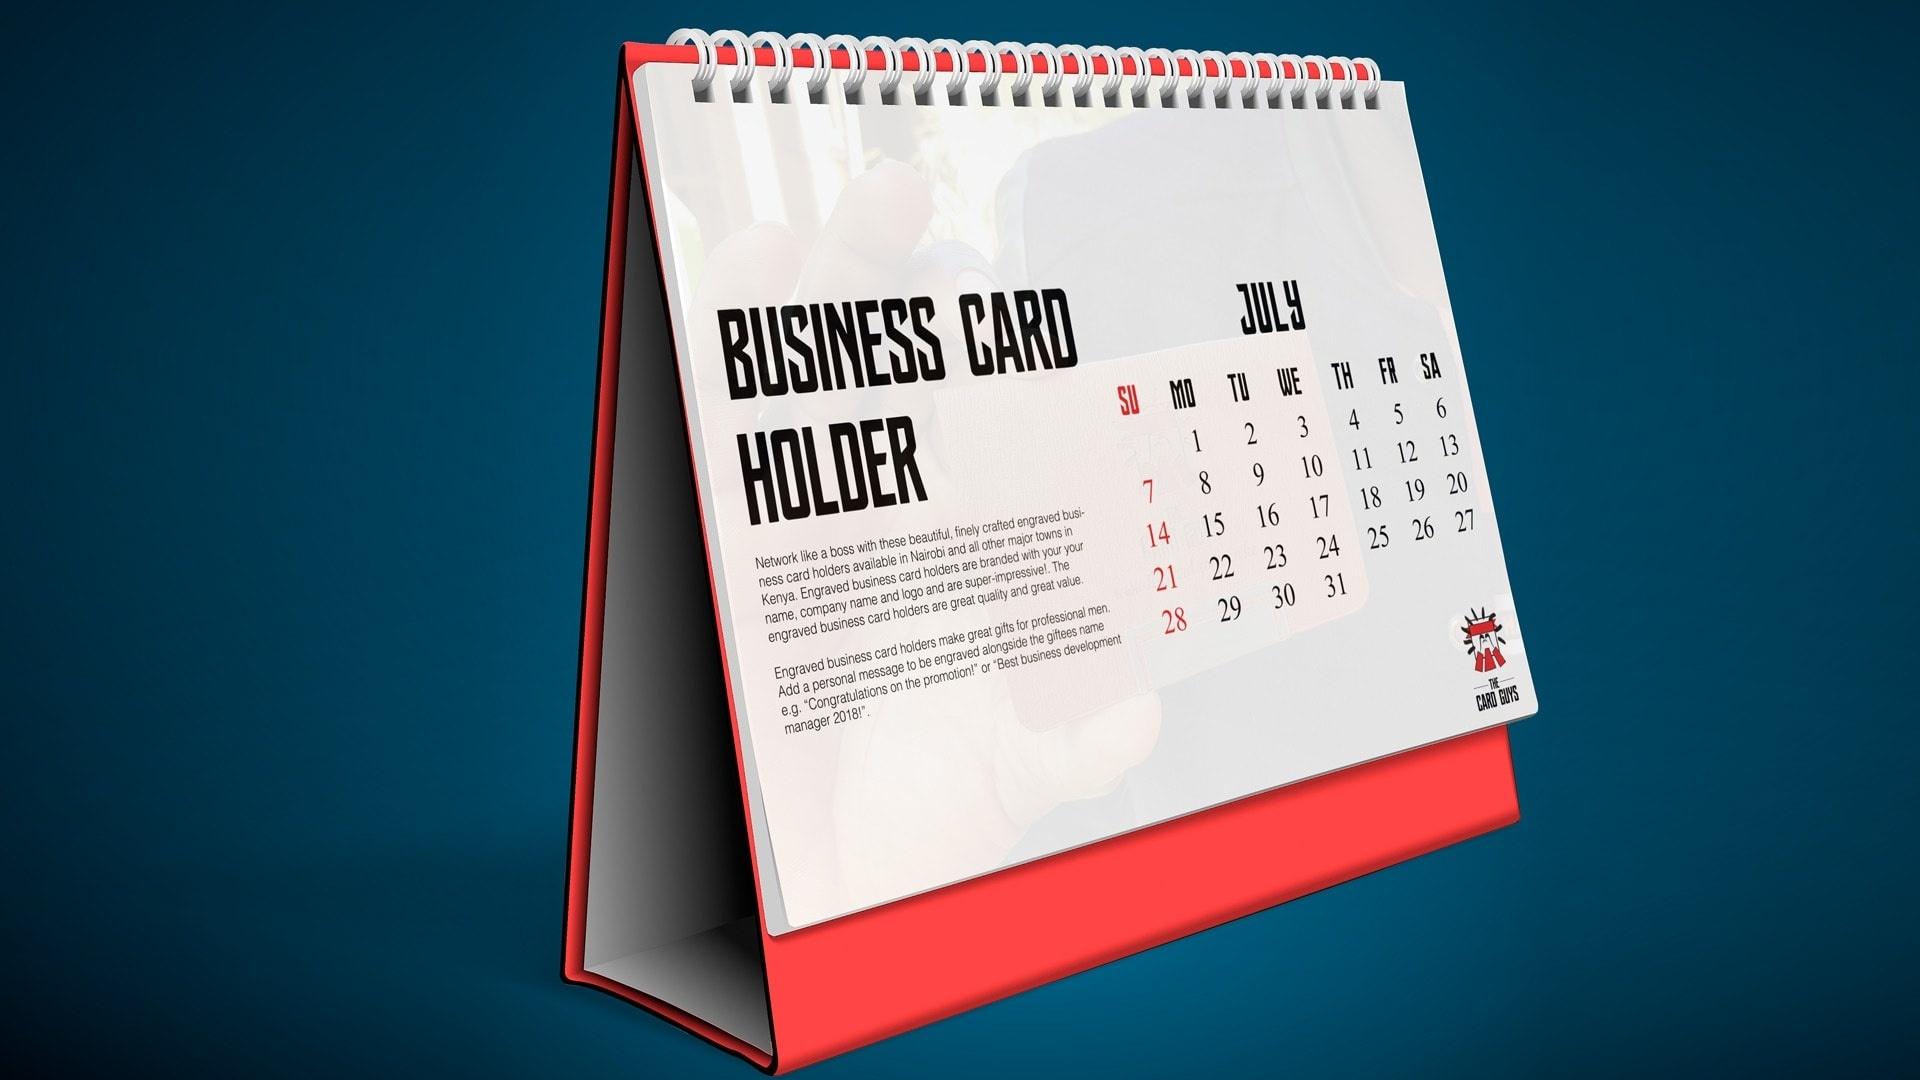 Print Desk Calendars Online In Nairobi Kenya | The Card Guys_Calendar Printing In Kenya